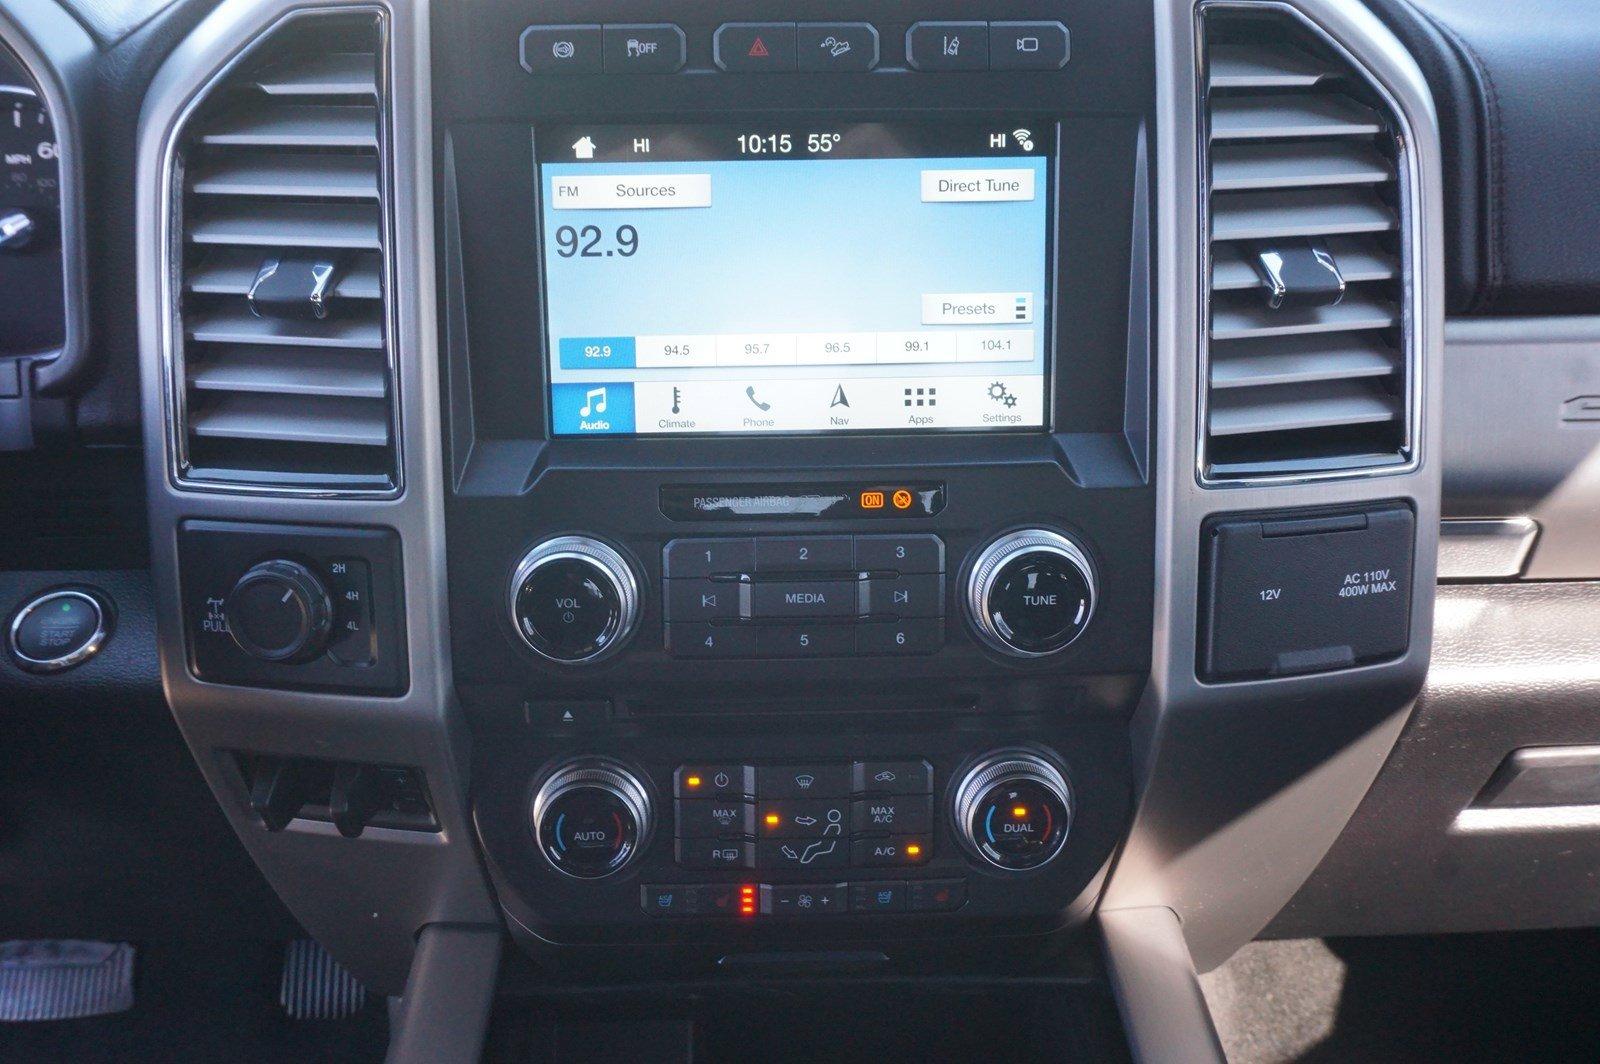 Pre-Owned 2018 Ford Super Duty F-250 SRW Platinum